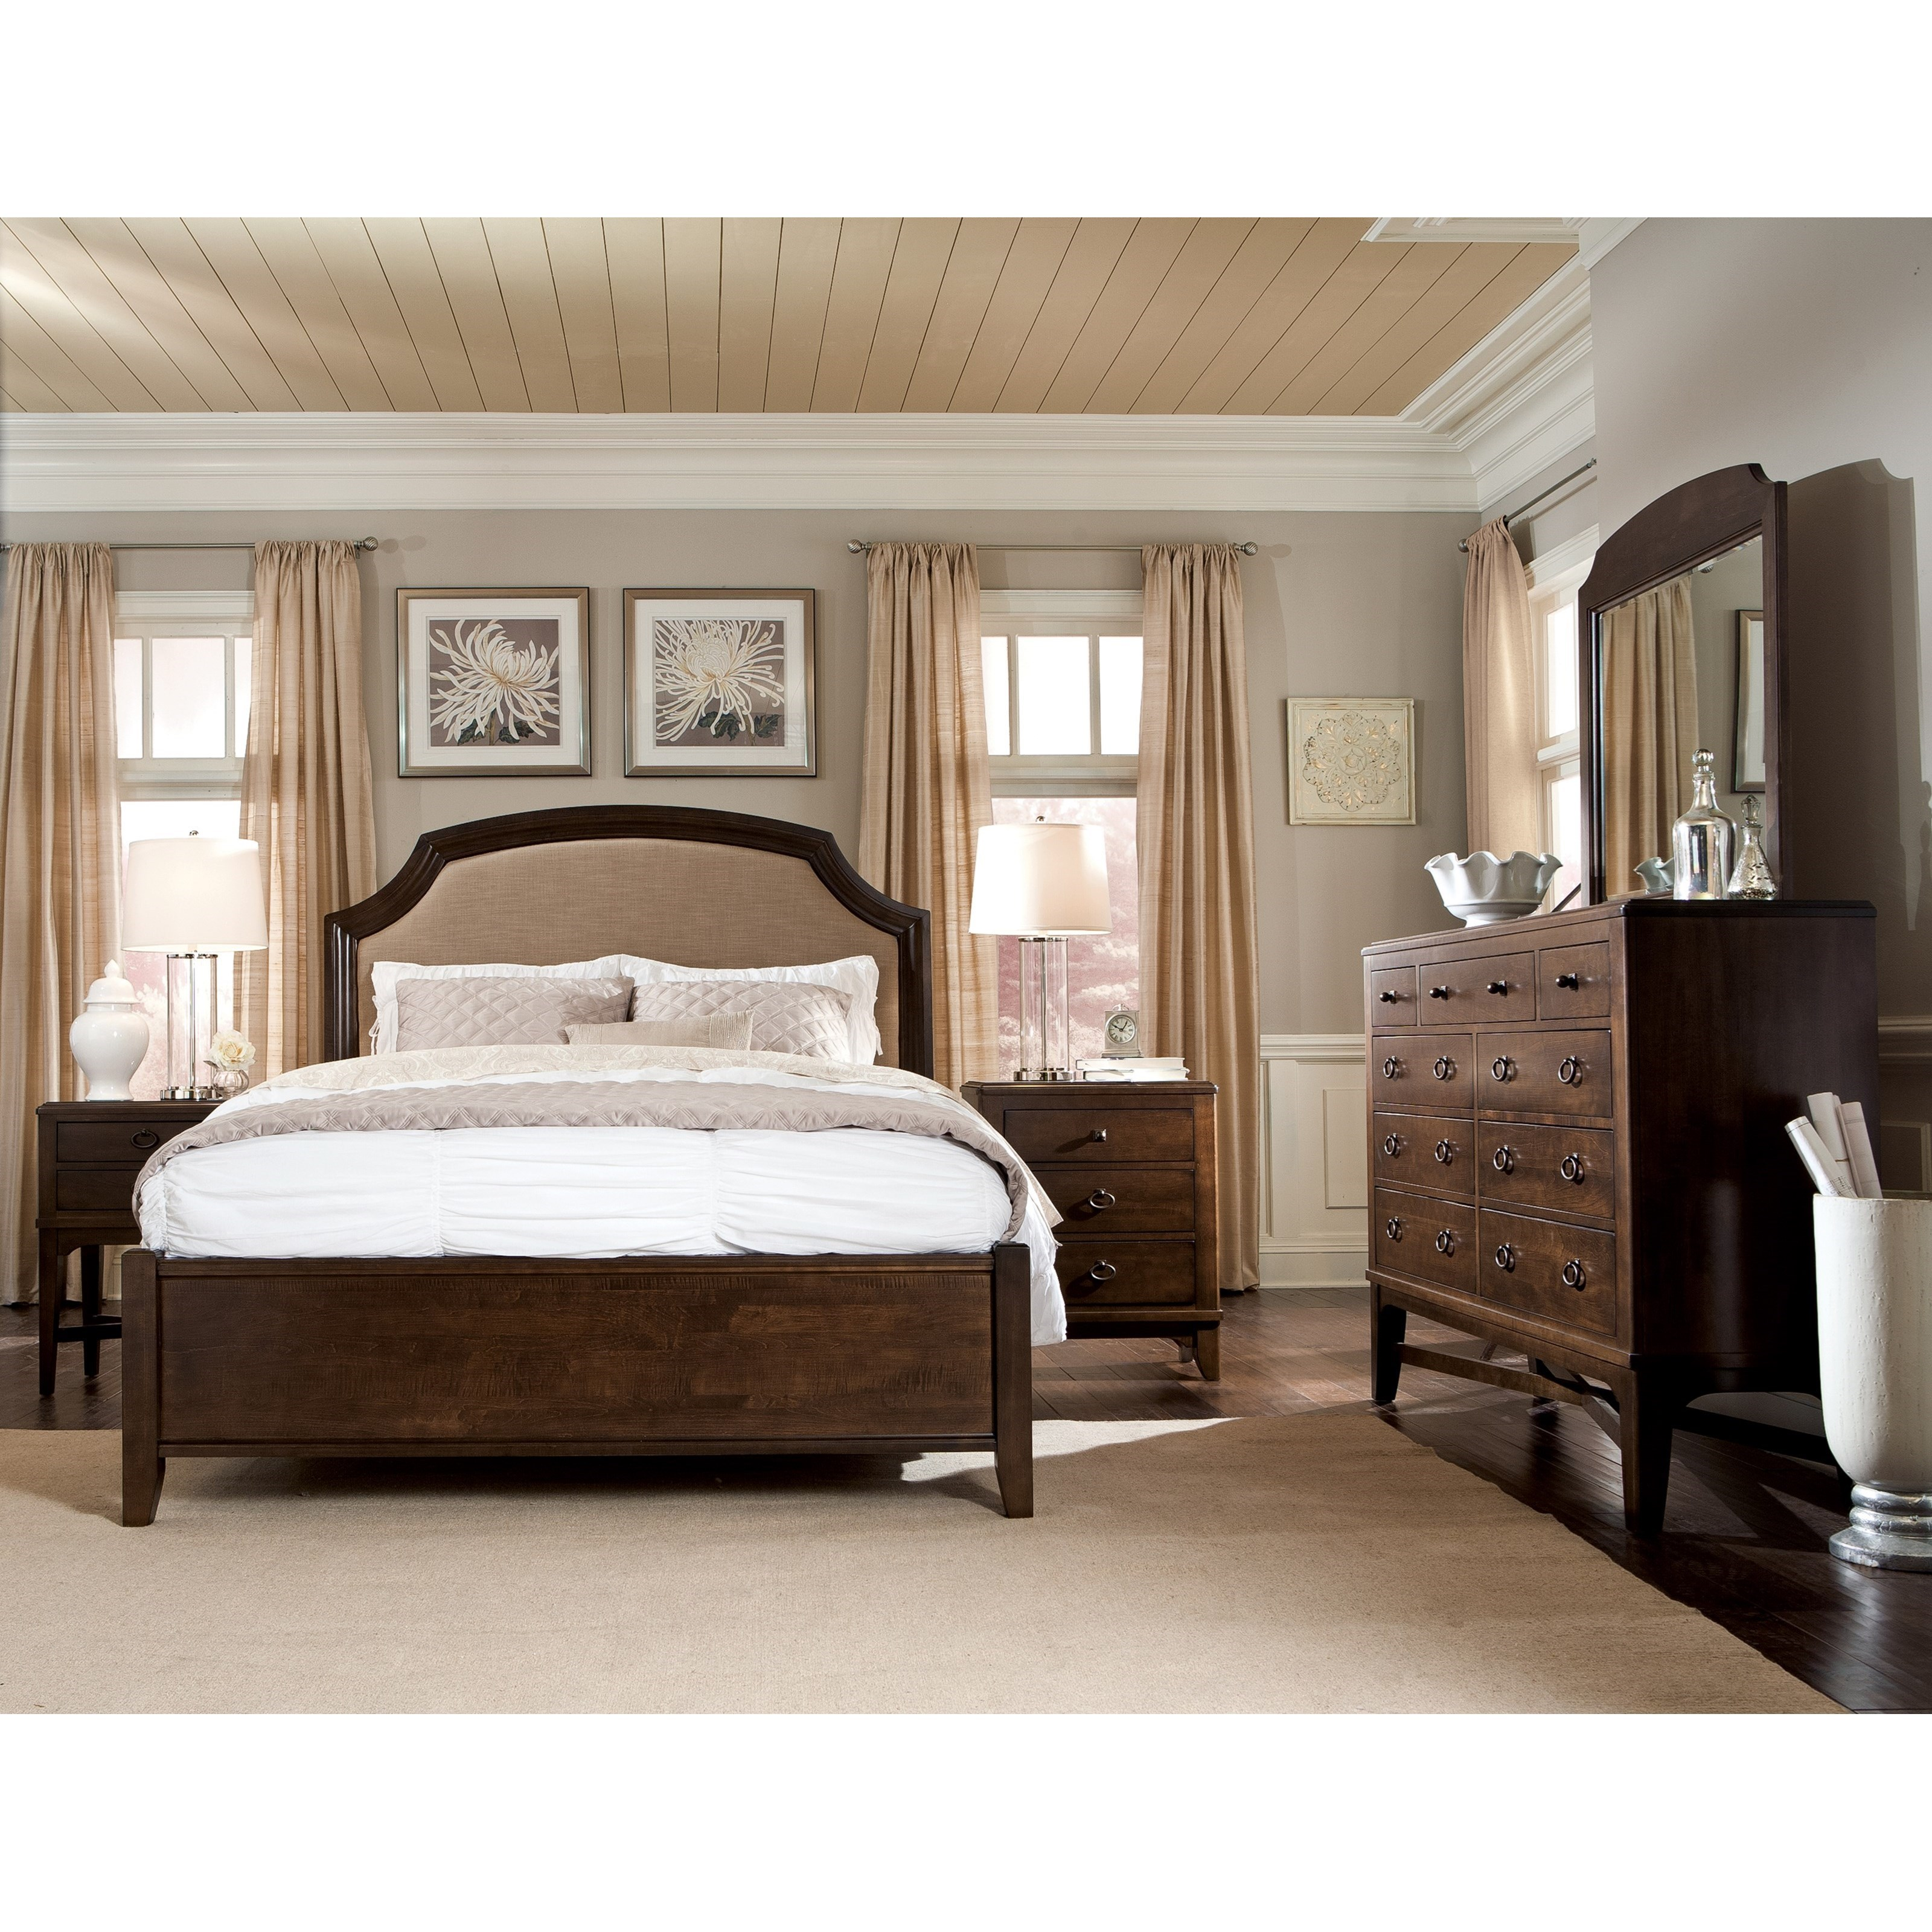 Glen Terrace Queen Bedroom Group by Durham at Stoney Creek Furniture